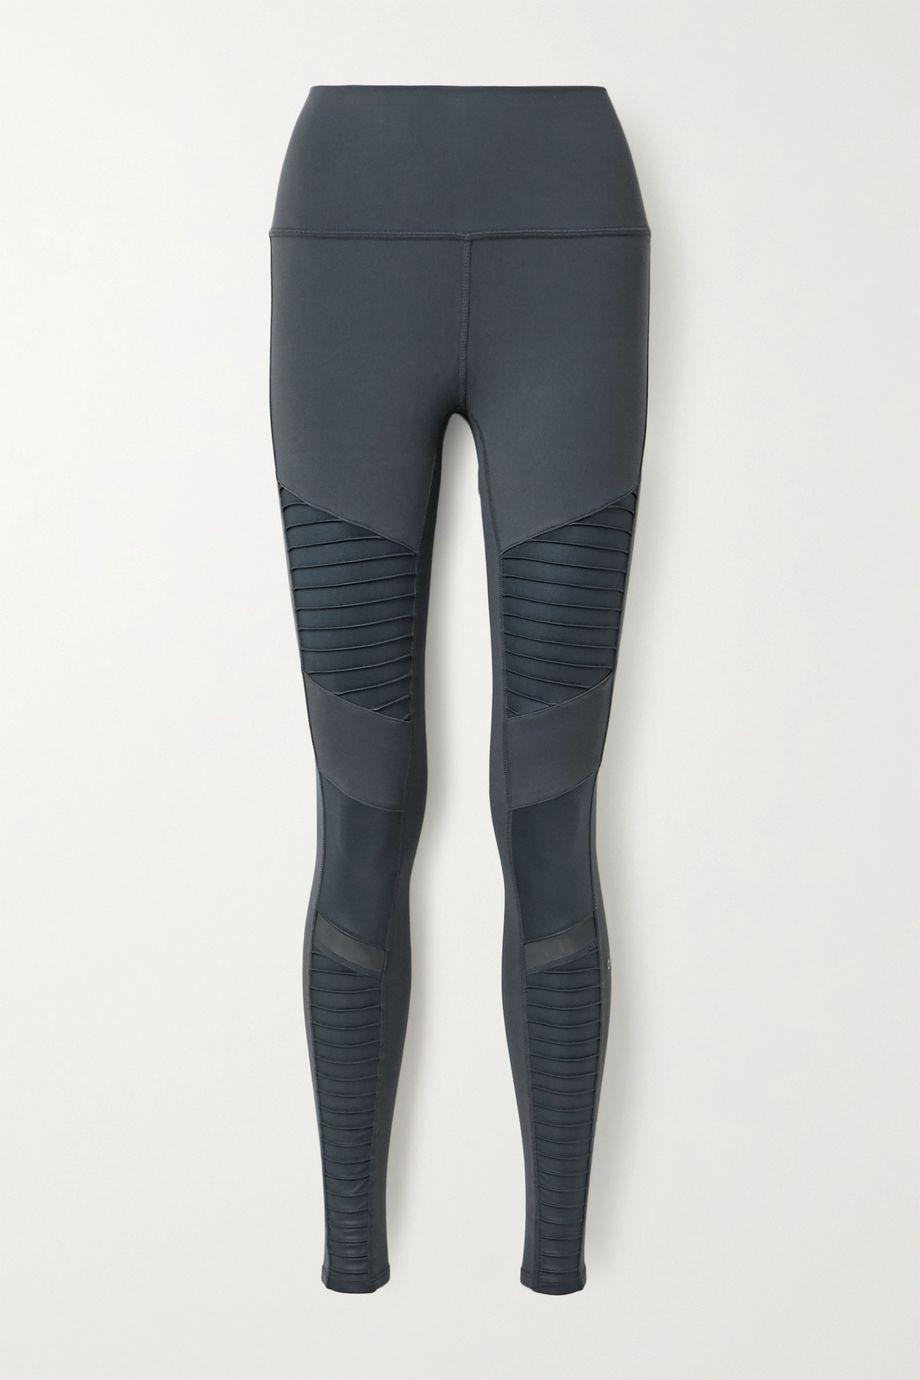 Alo Yoga Moto mesh-trimmed stretch leggings